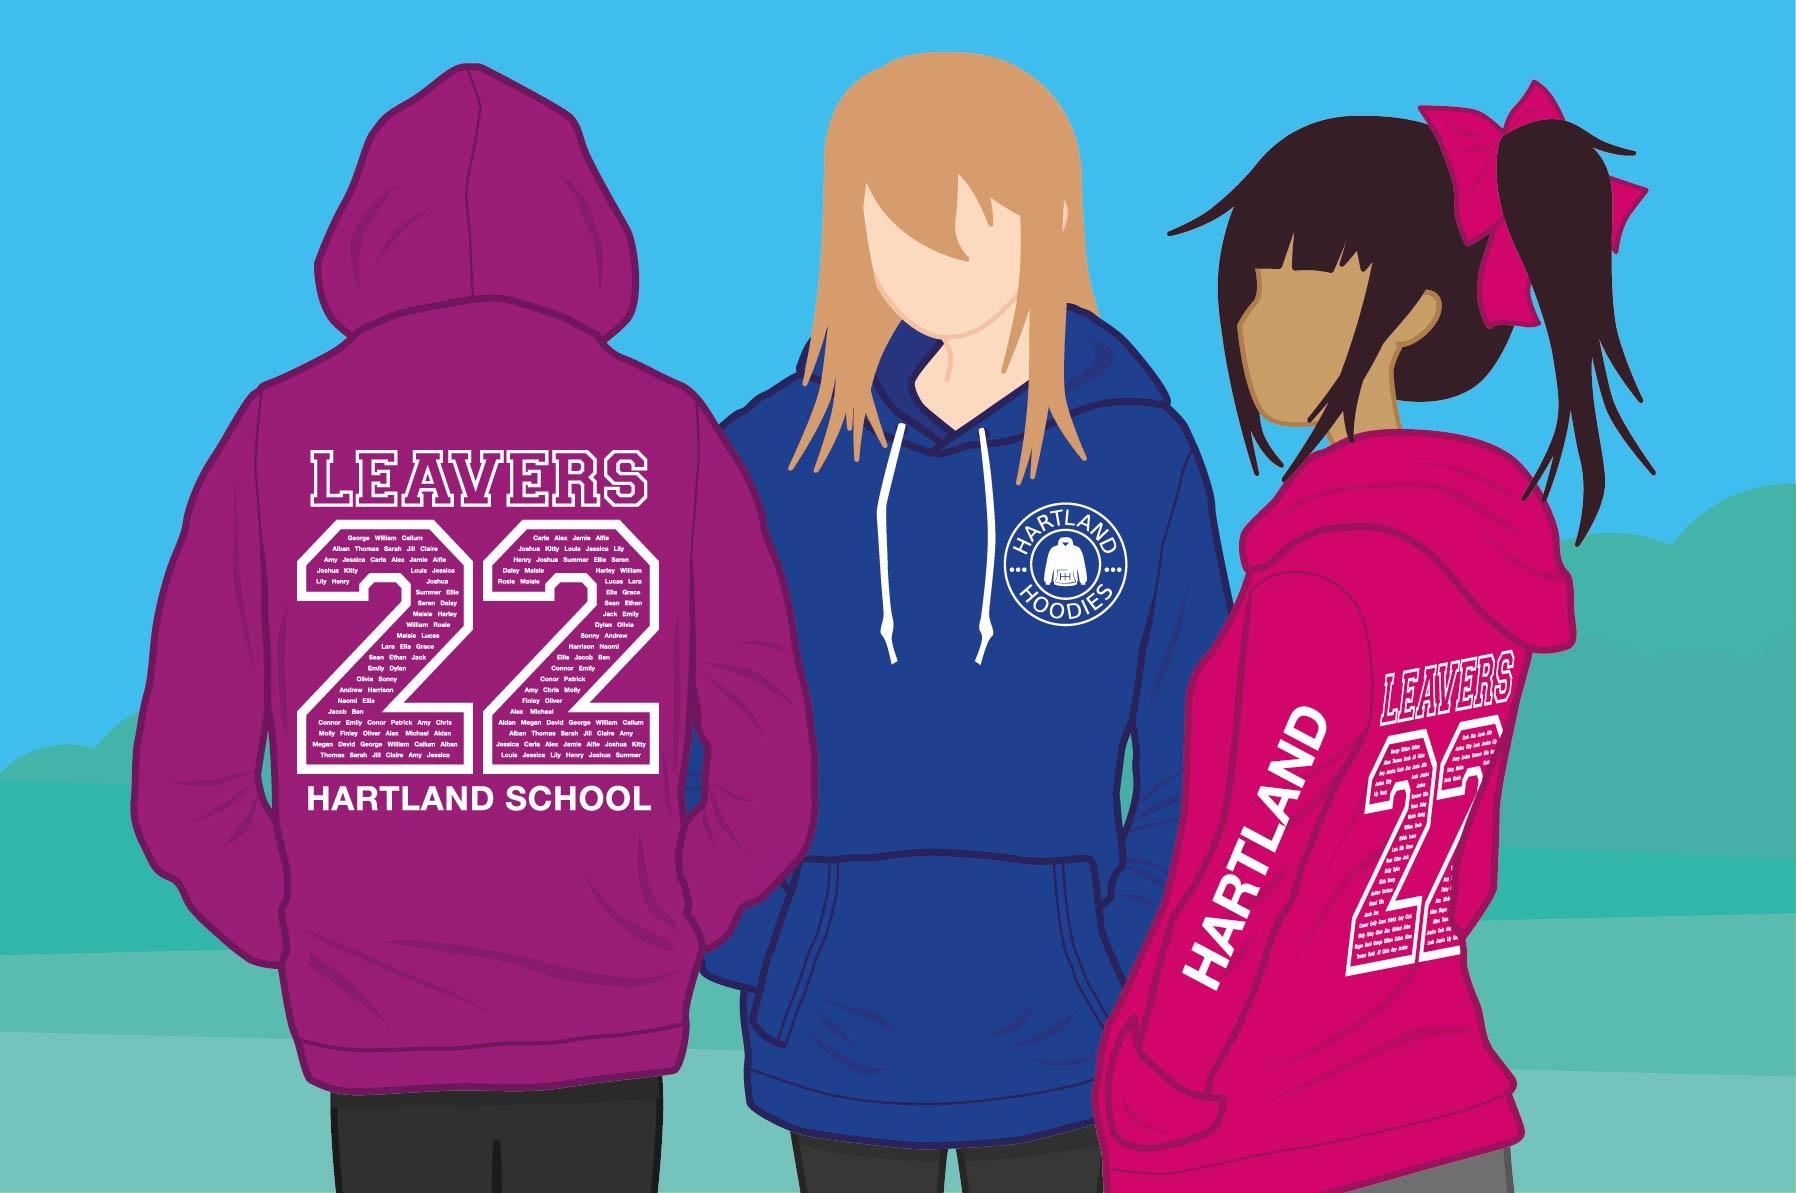 photo of children wearing school trip hoodies from Hartland Hoodies